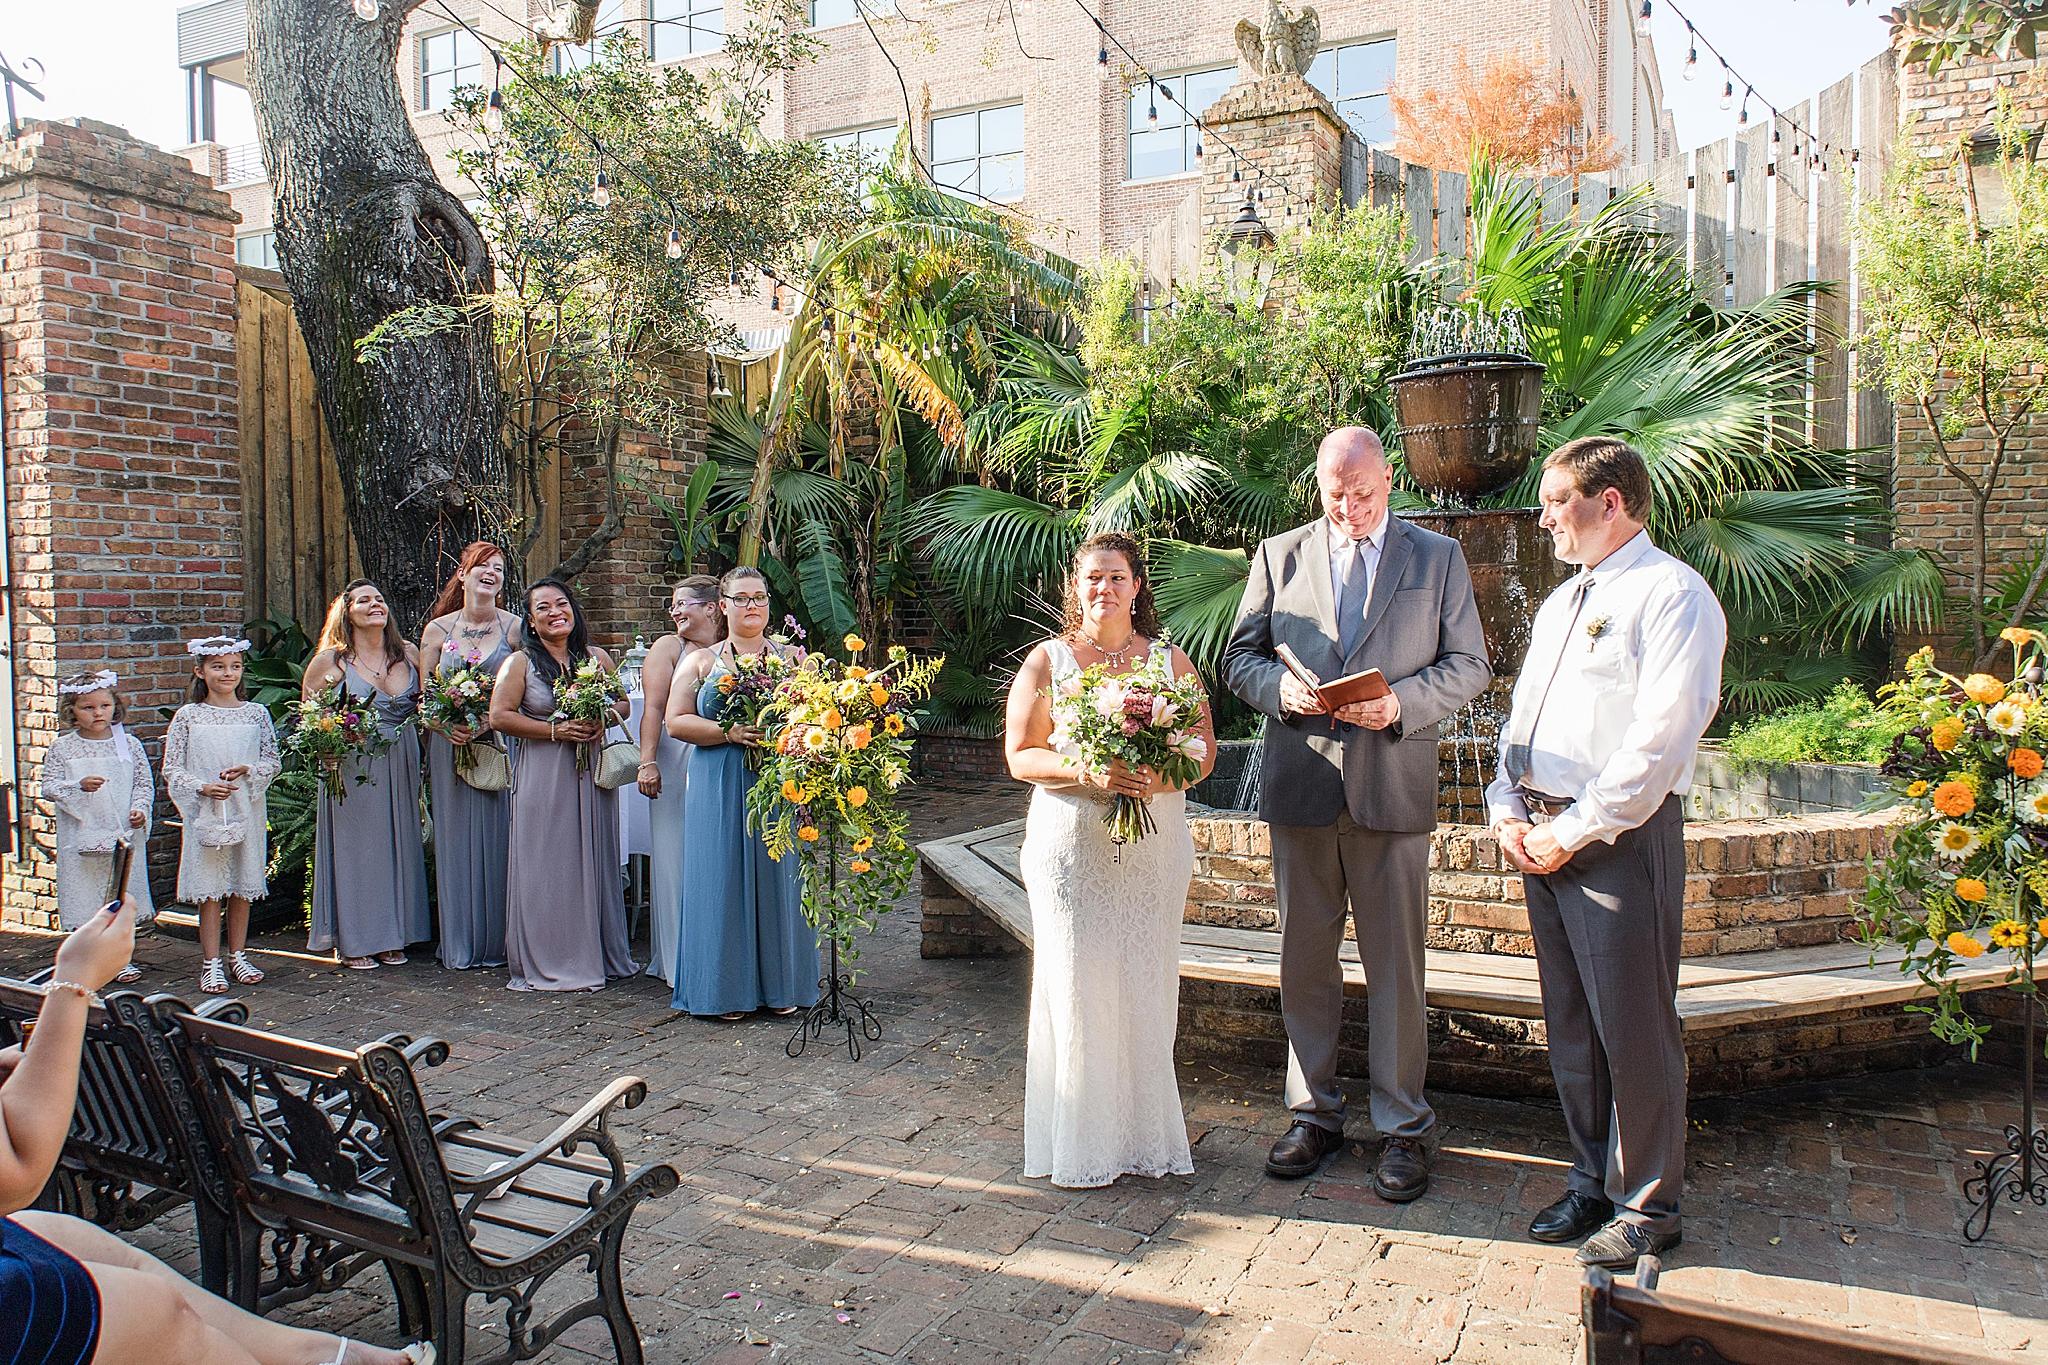 Seville Quarter wedding ceremony in Florida